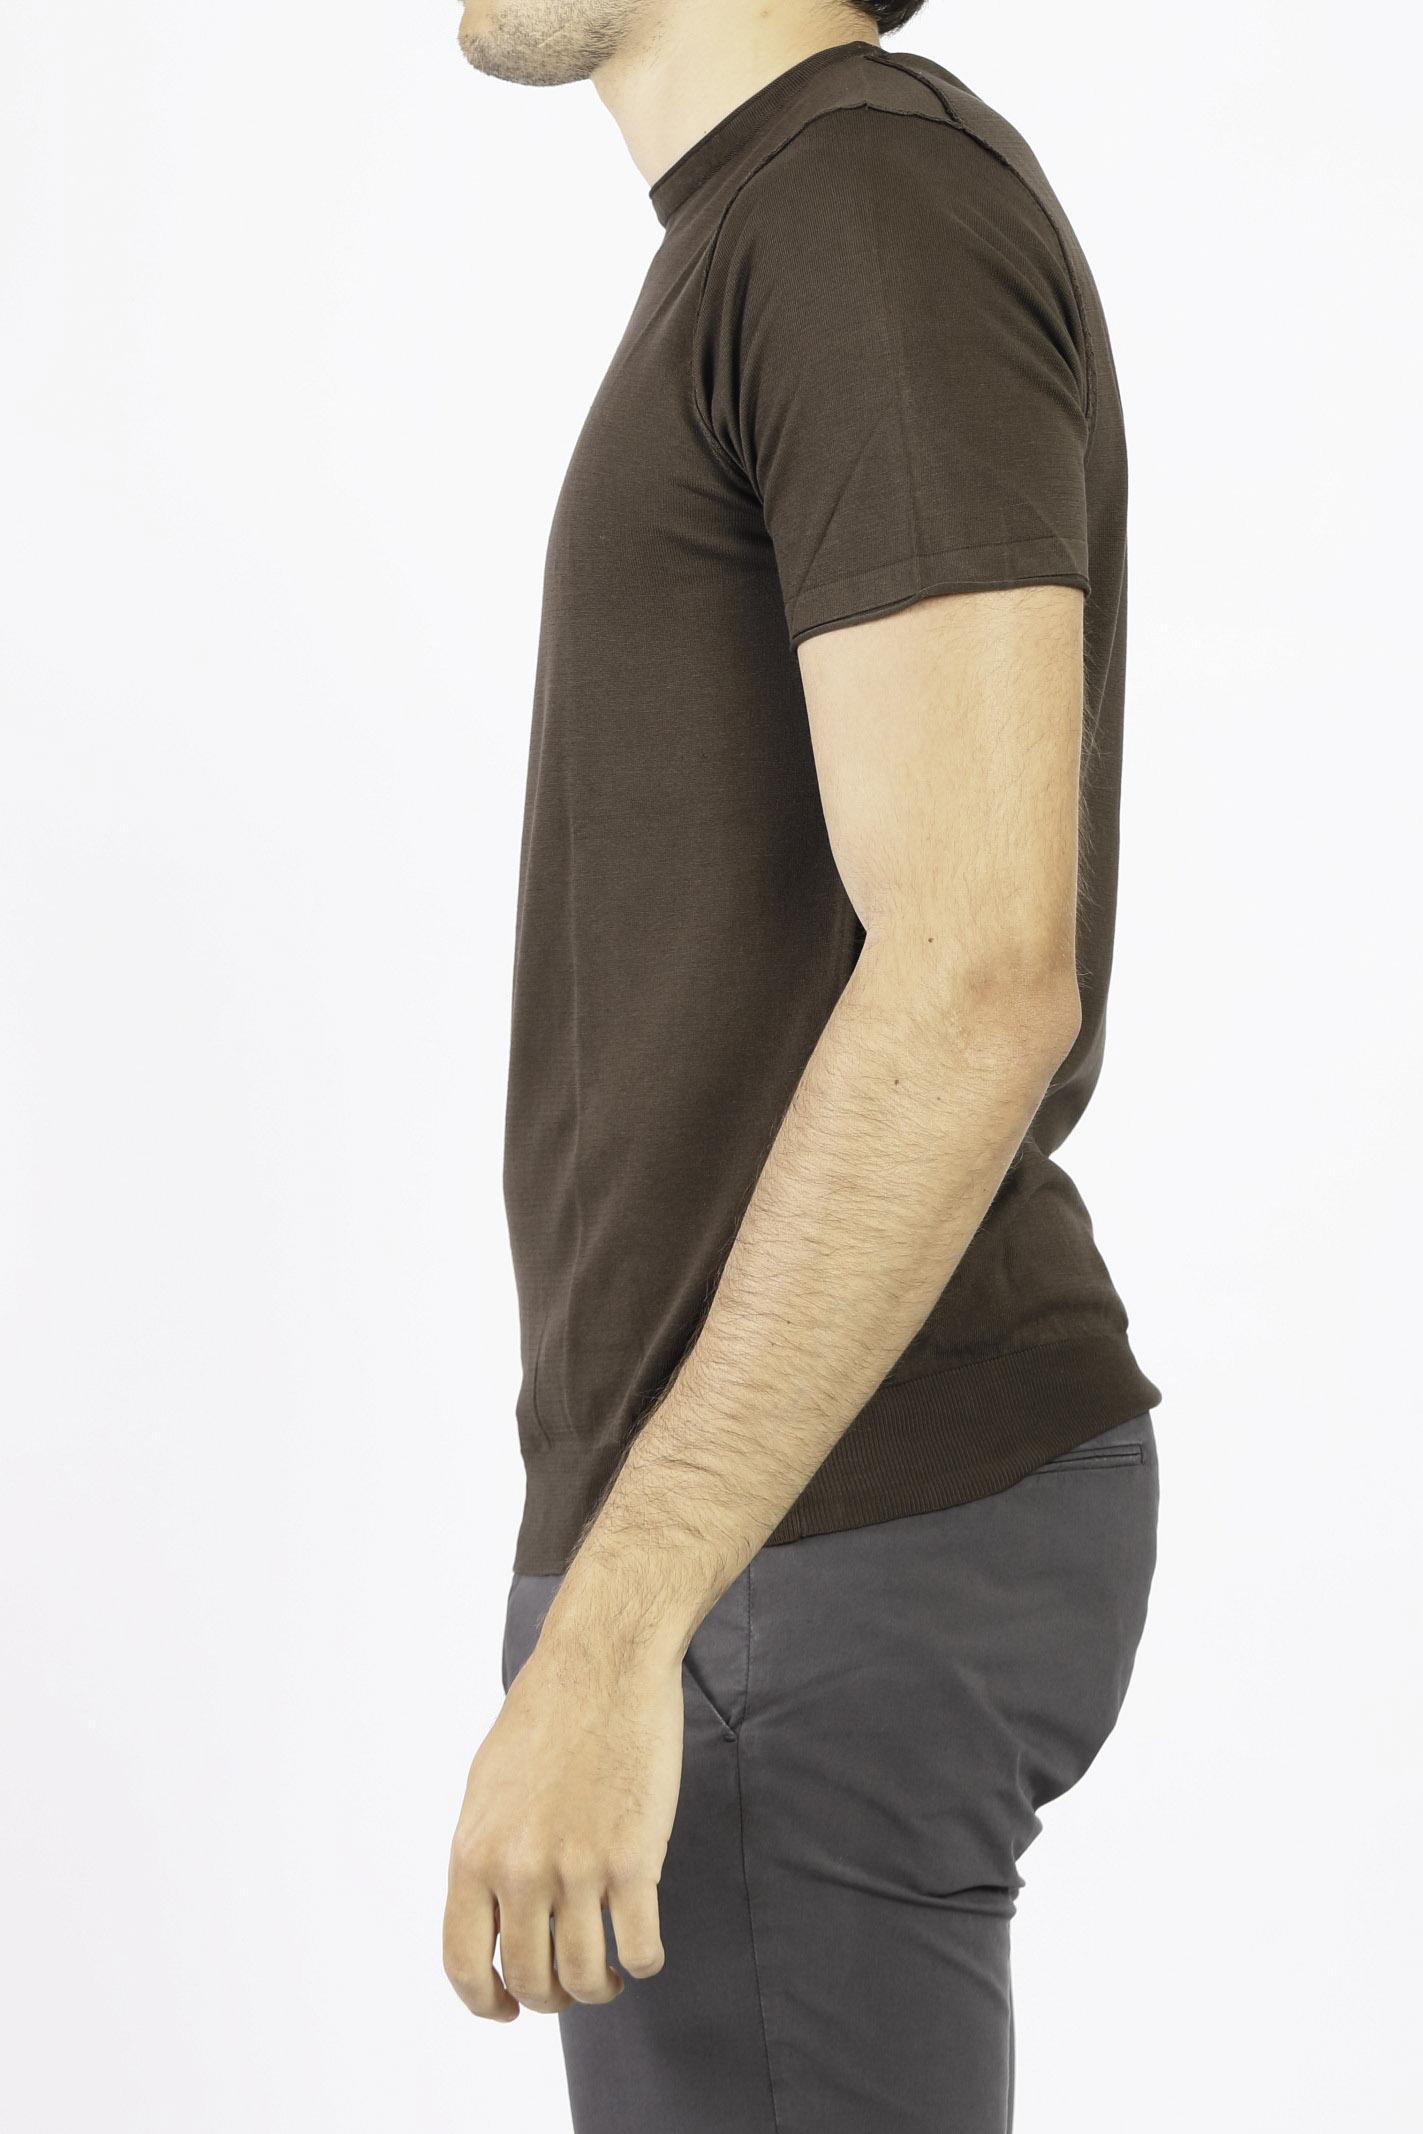 COTTON T-SHIRT JEORDIE'S | T-shirt | 60554356